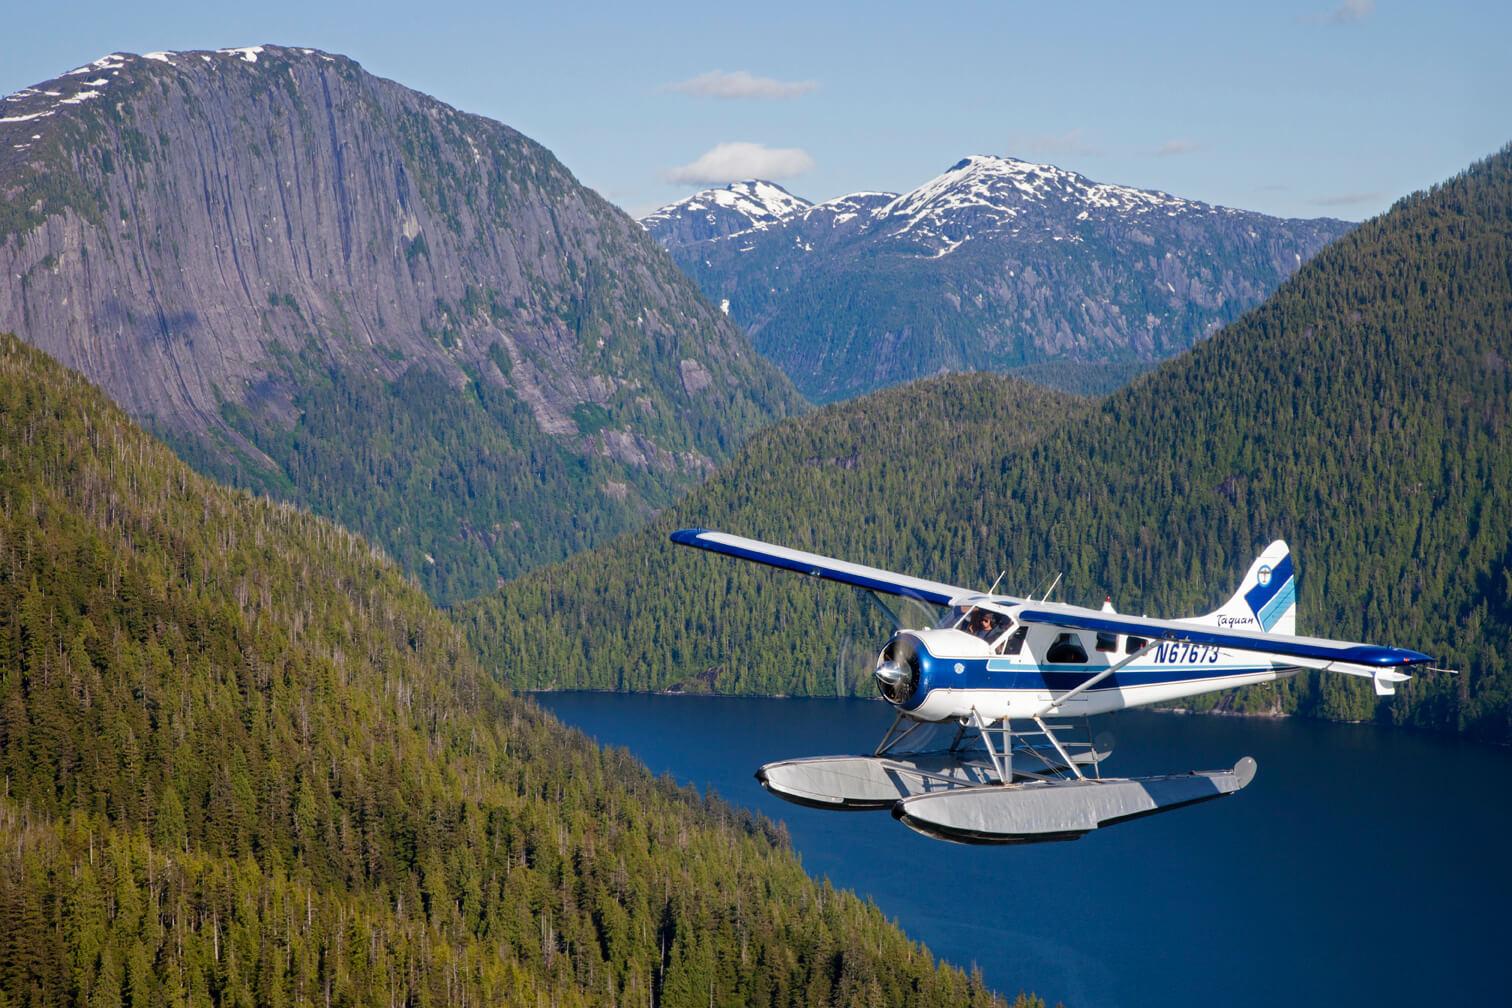 https://secureservercdn.net/166.62.110.60/xmd.039.myftpupload.com/wp-content/uploads/2018/09/Misty-Fjords-Flightseeing.jpg?time=1634937609